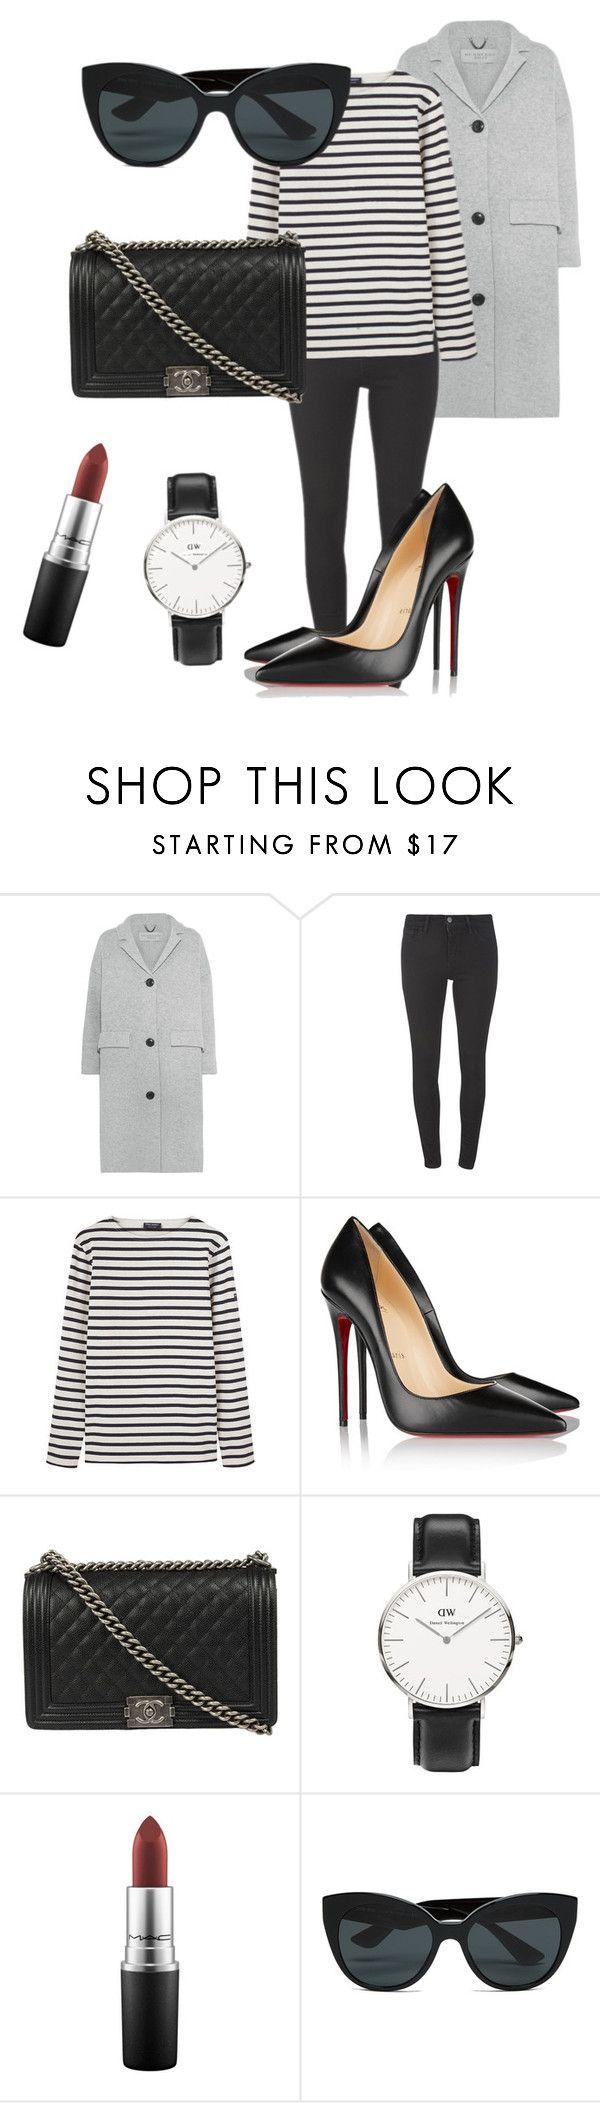 #outfit #fashion #chanel #boybag #heels #louboutin #fall